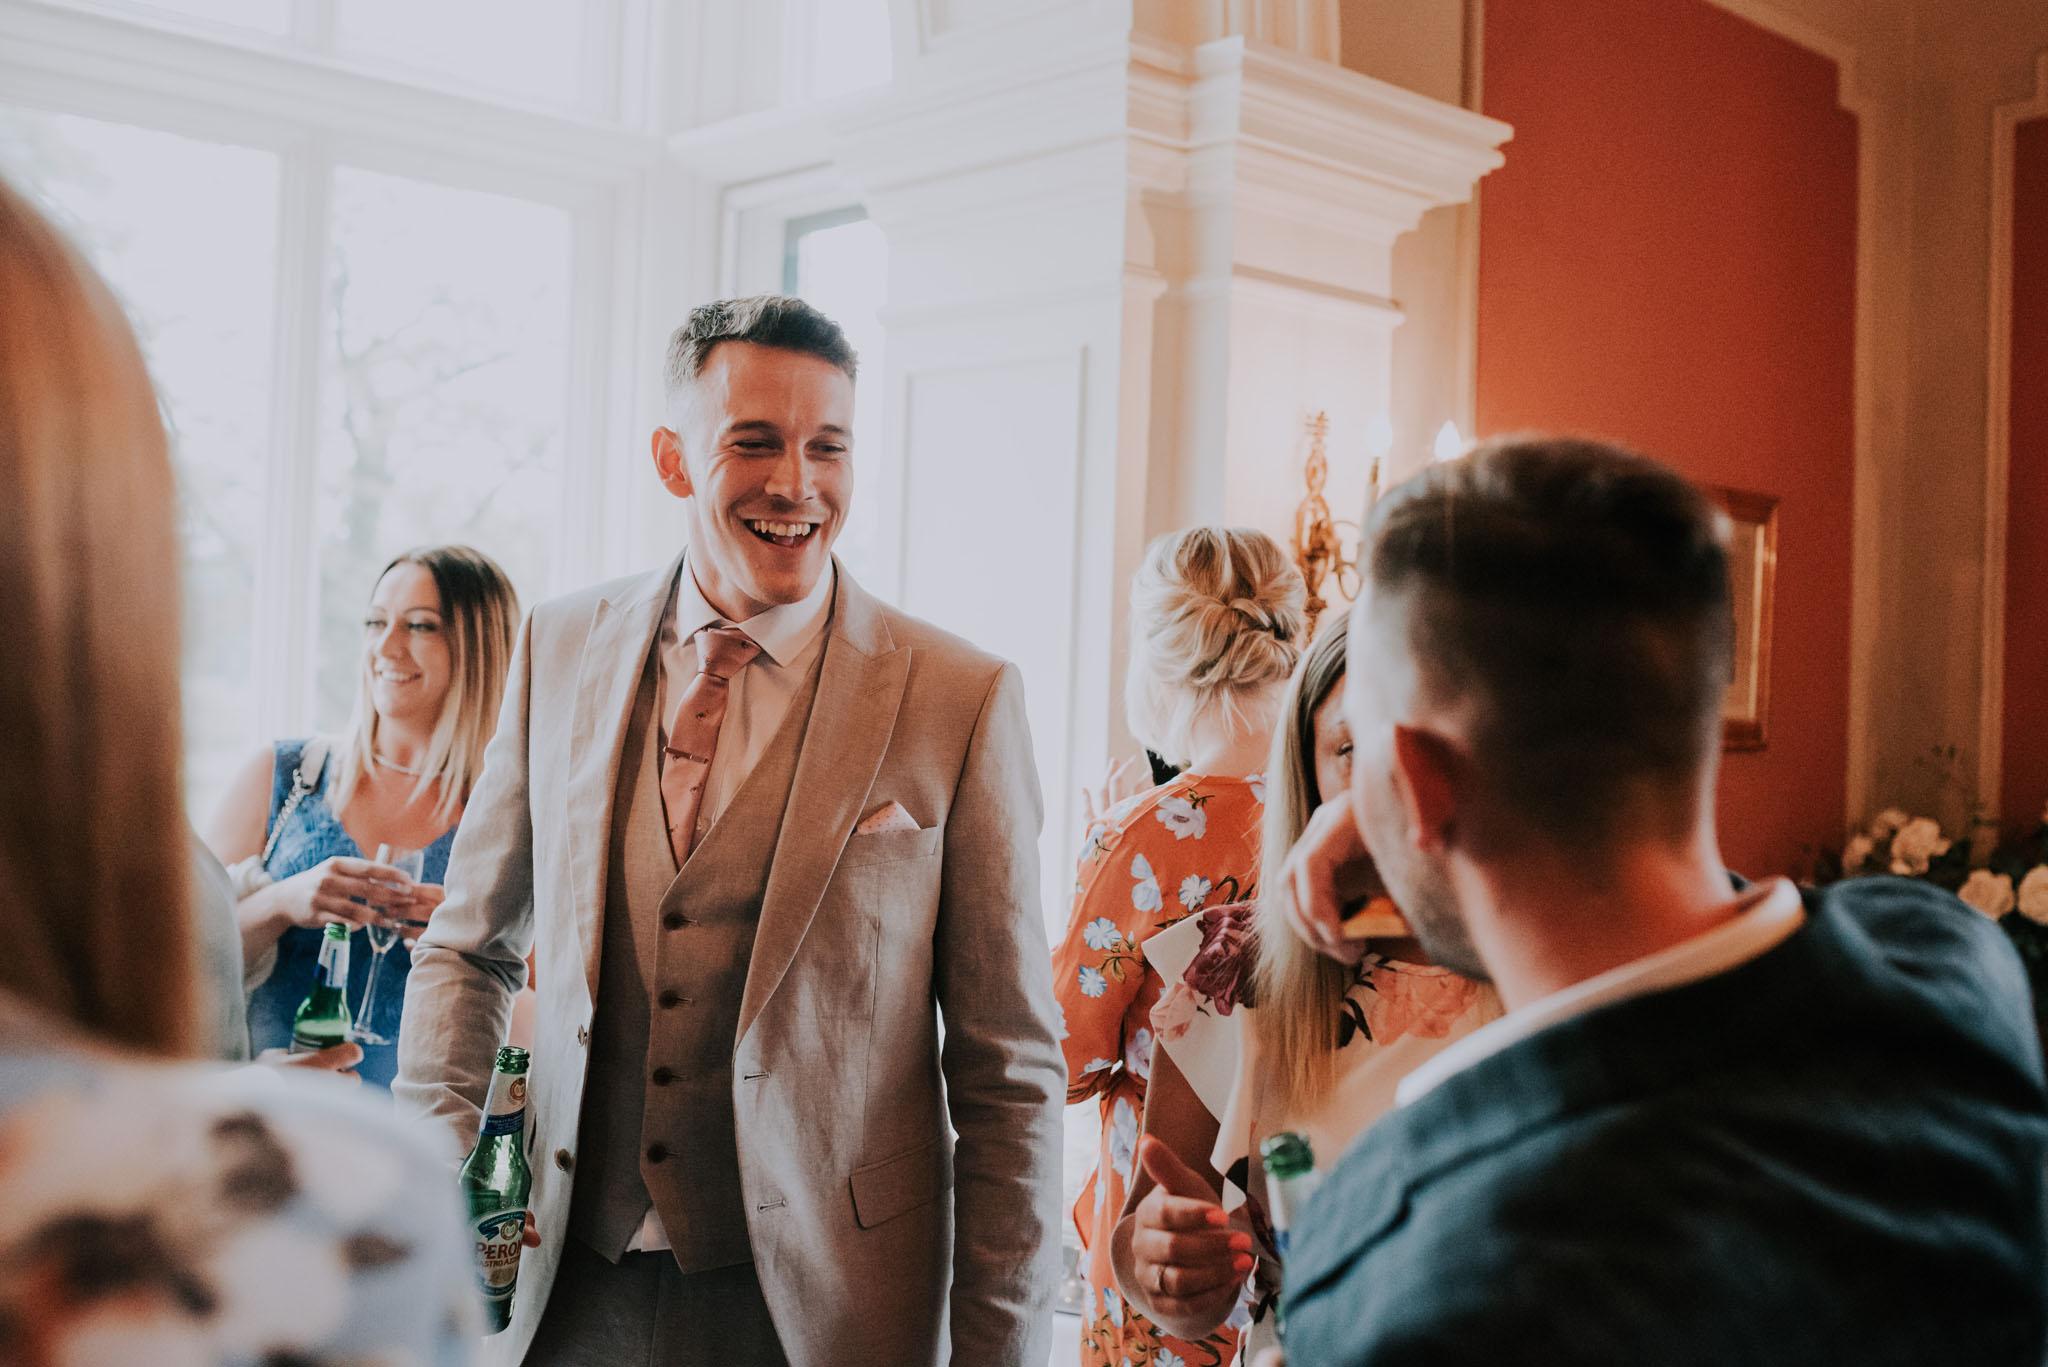 wedding-photographer-glewstone-court-hereford-scott-stockwell-photography317.jpg